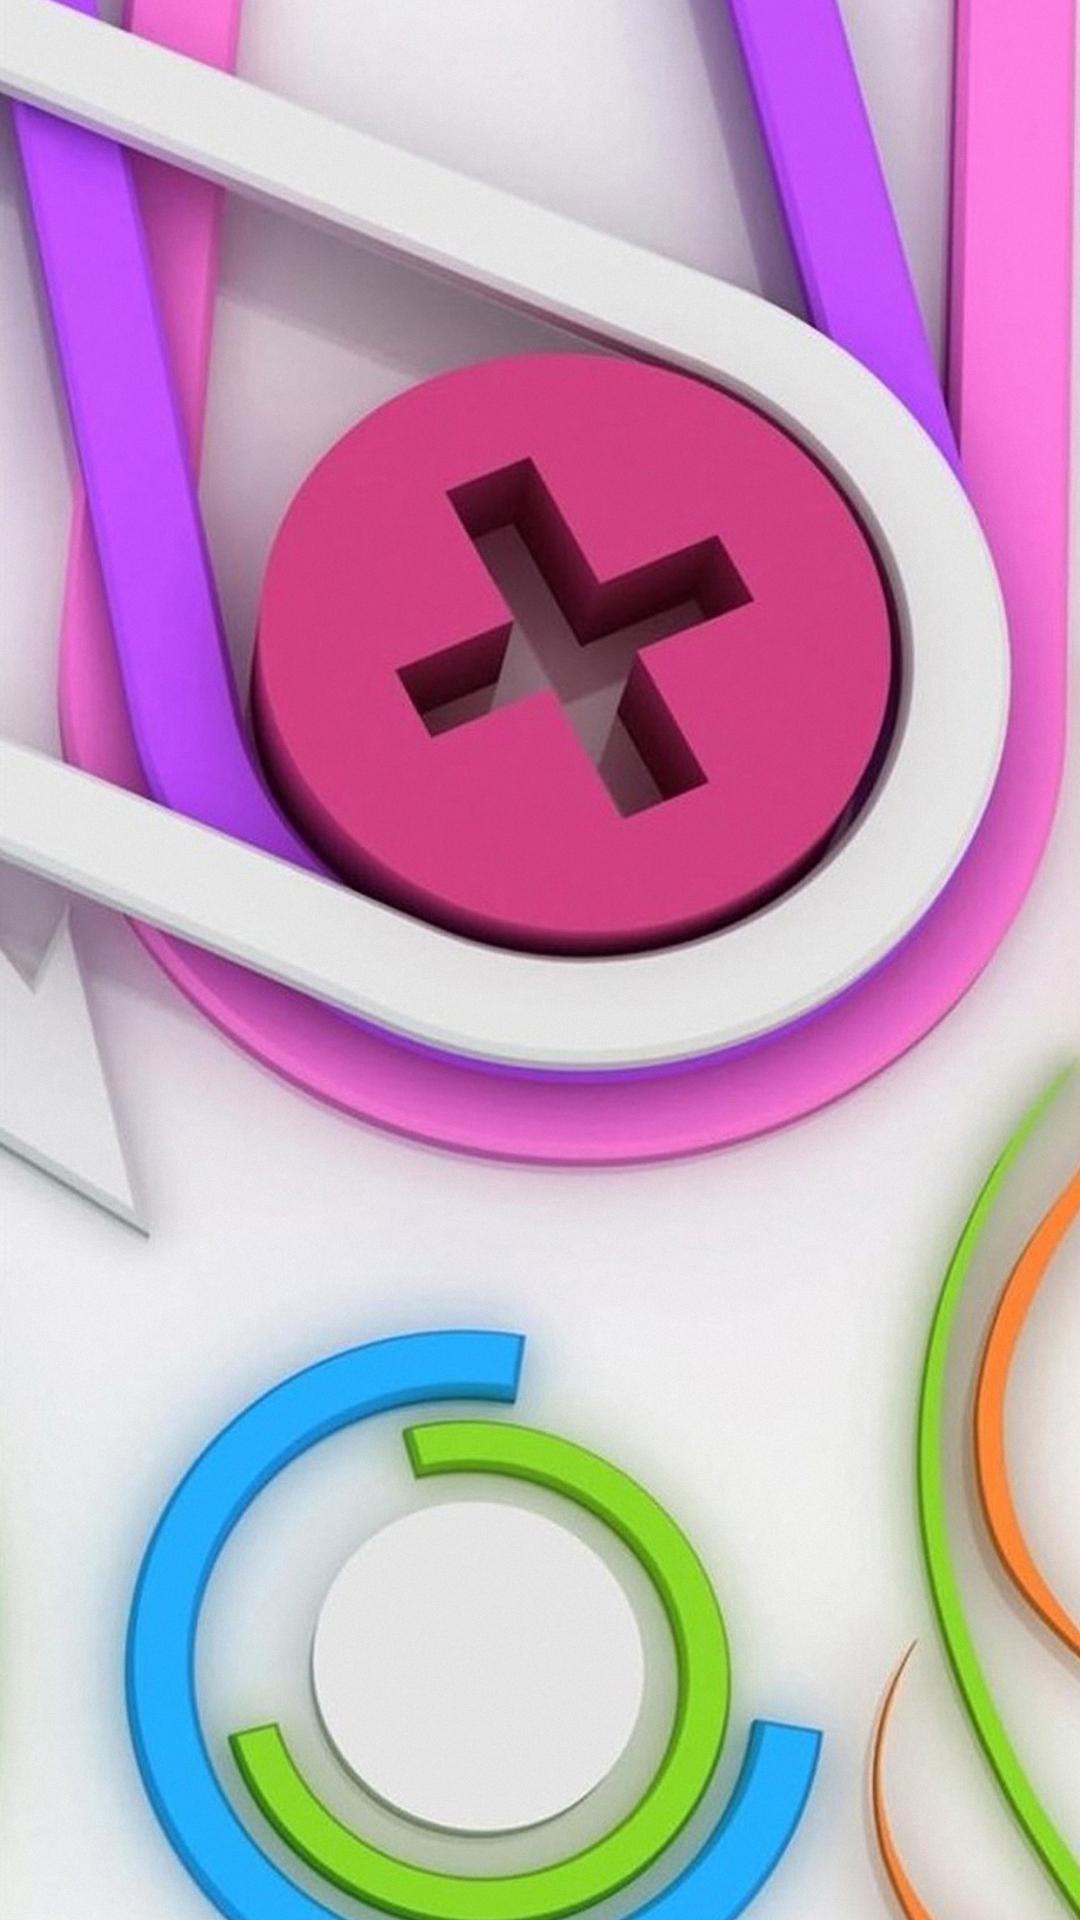 iphone 6s wallpaper HD 19282spf1 1080x1920jpg 1080x1920